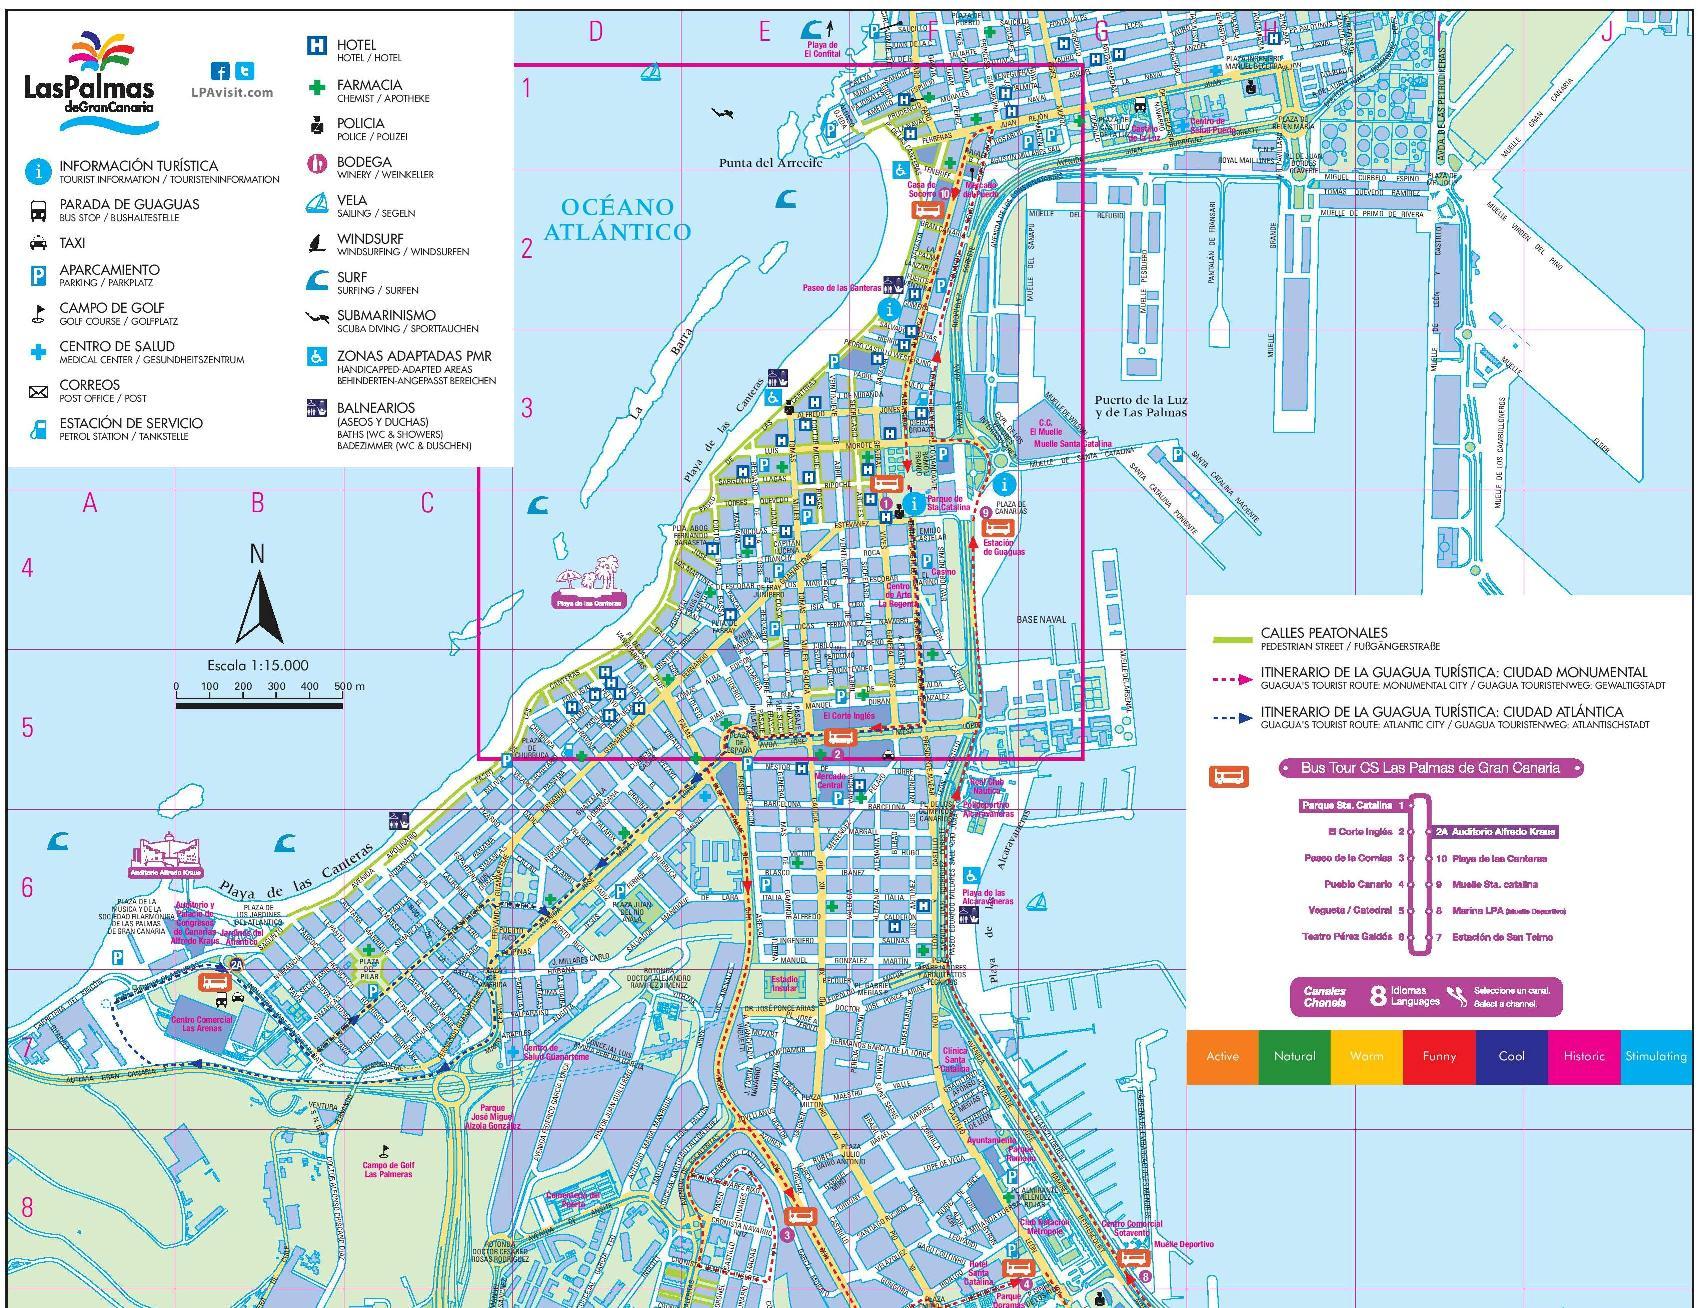 News Tourist Map of Las Palmas de Gran Canaria